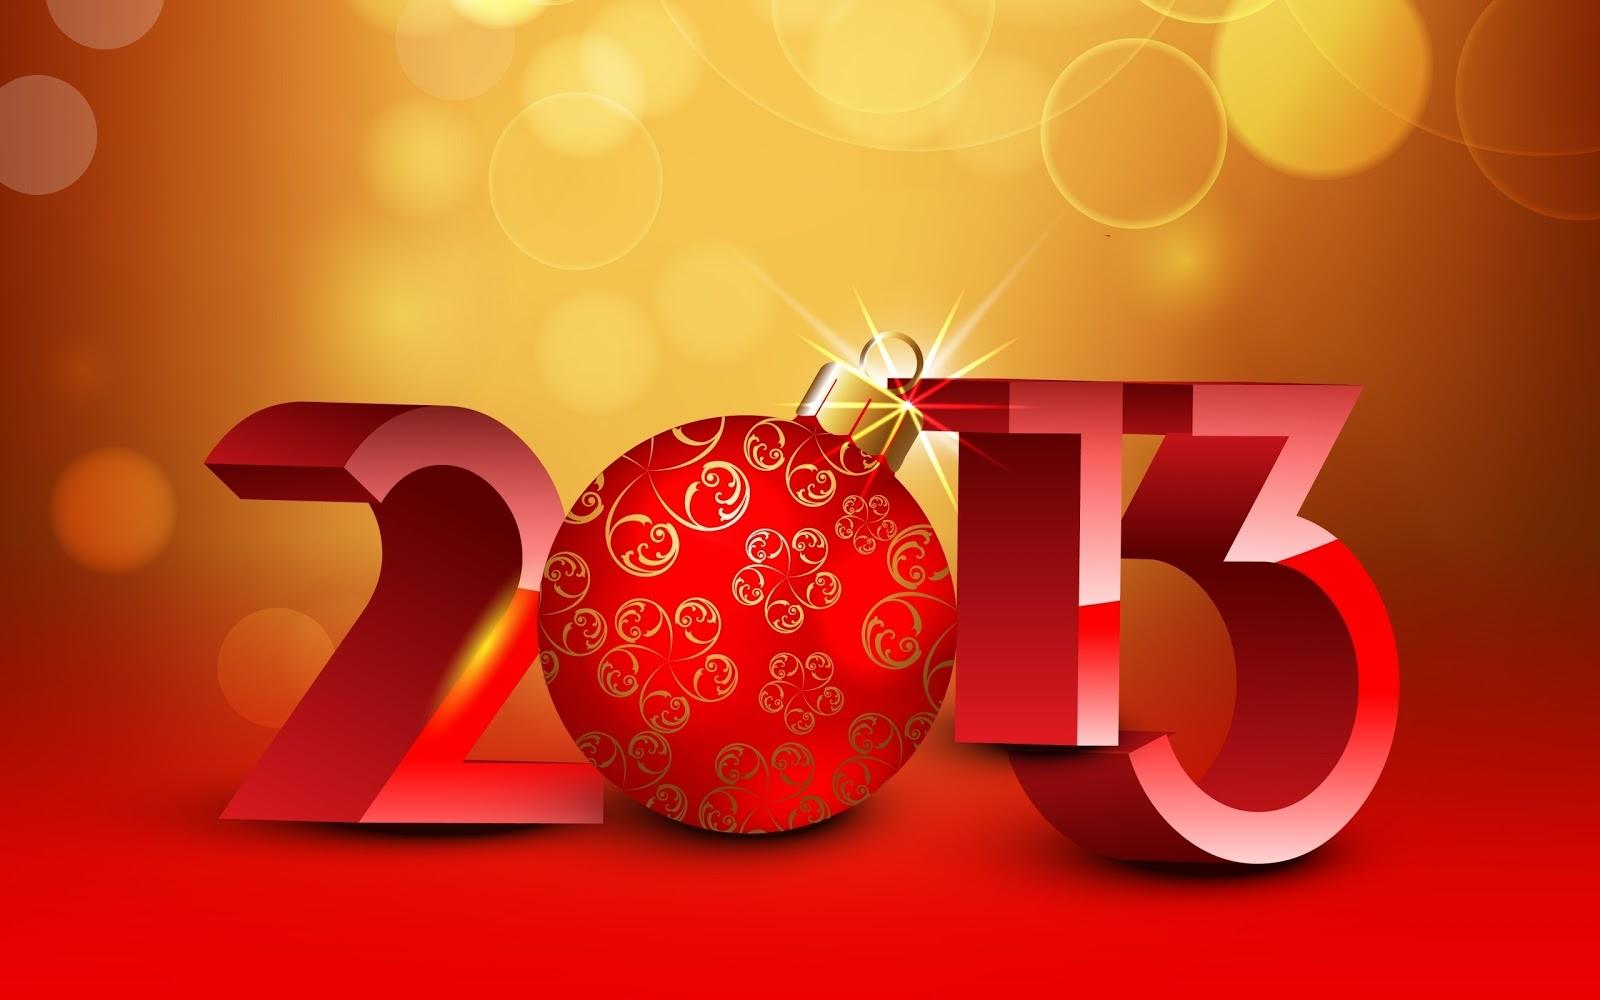 http://1.bp.blogspot.com/-L7JfSp3H0hQ/UOCXZAnCduI/AAAAAAAAANs/mqzbej028HE/s1600/Happy-New-Year-2013-Wallpaper-1.jpg